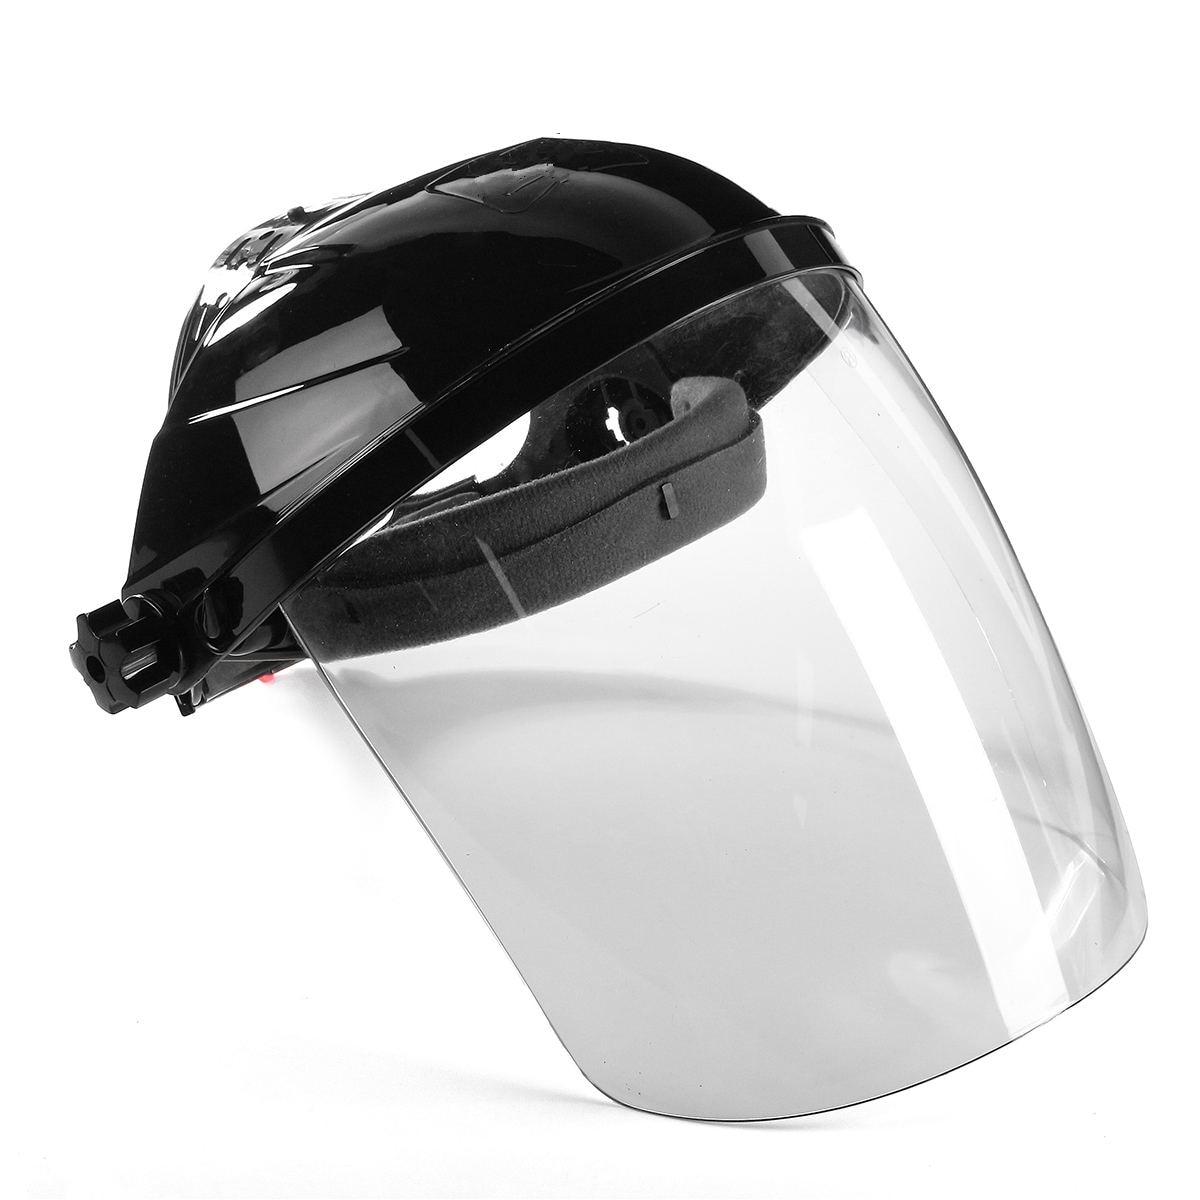 Transparent Lens Anti-UV Anti-shock Welding Helmet Face Shield Solder Mask Face Eye Protect Shield Anti-shock transparent lens anti uv anti shock welding helmet face shield solder mask face eye protect shield anti shock